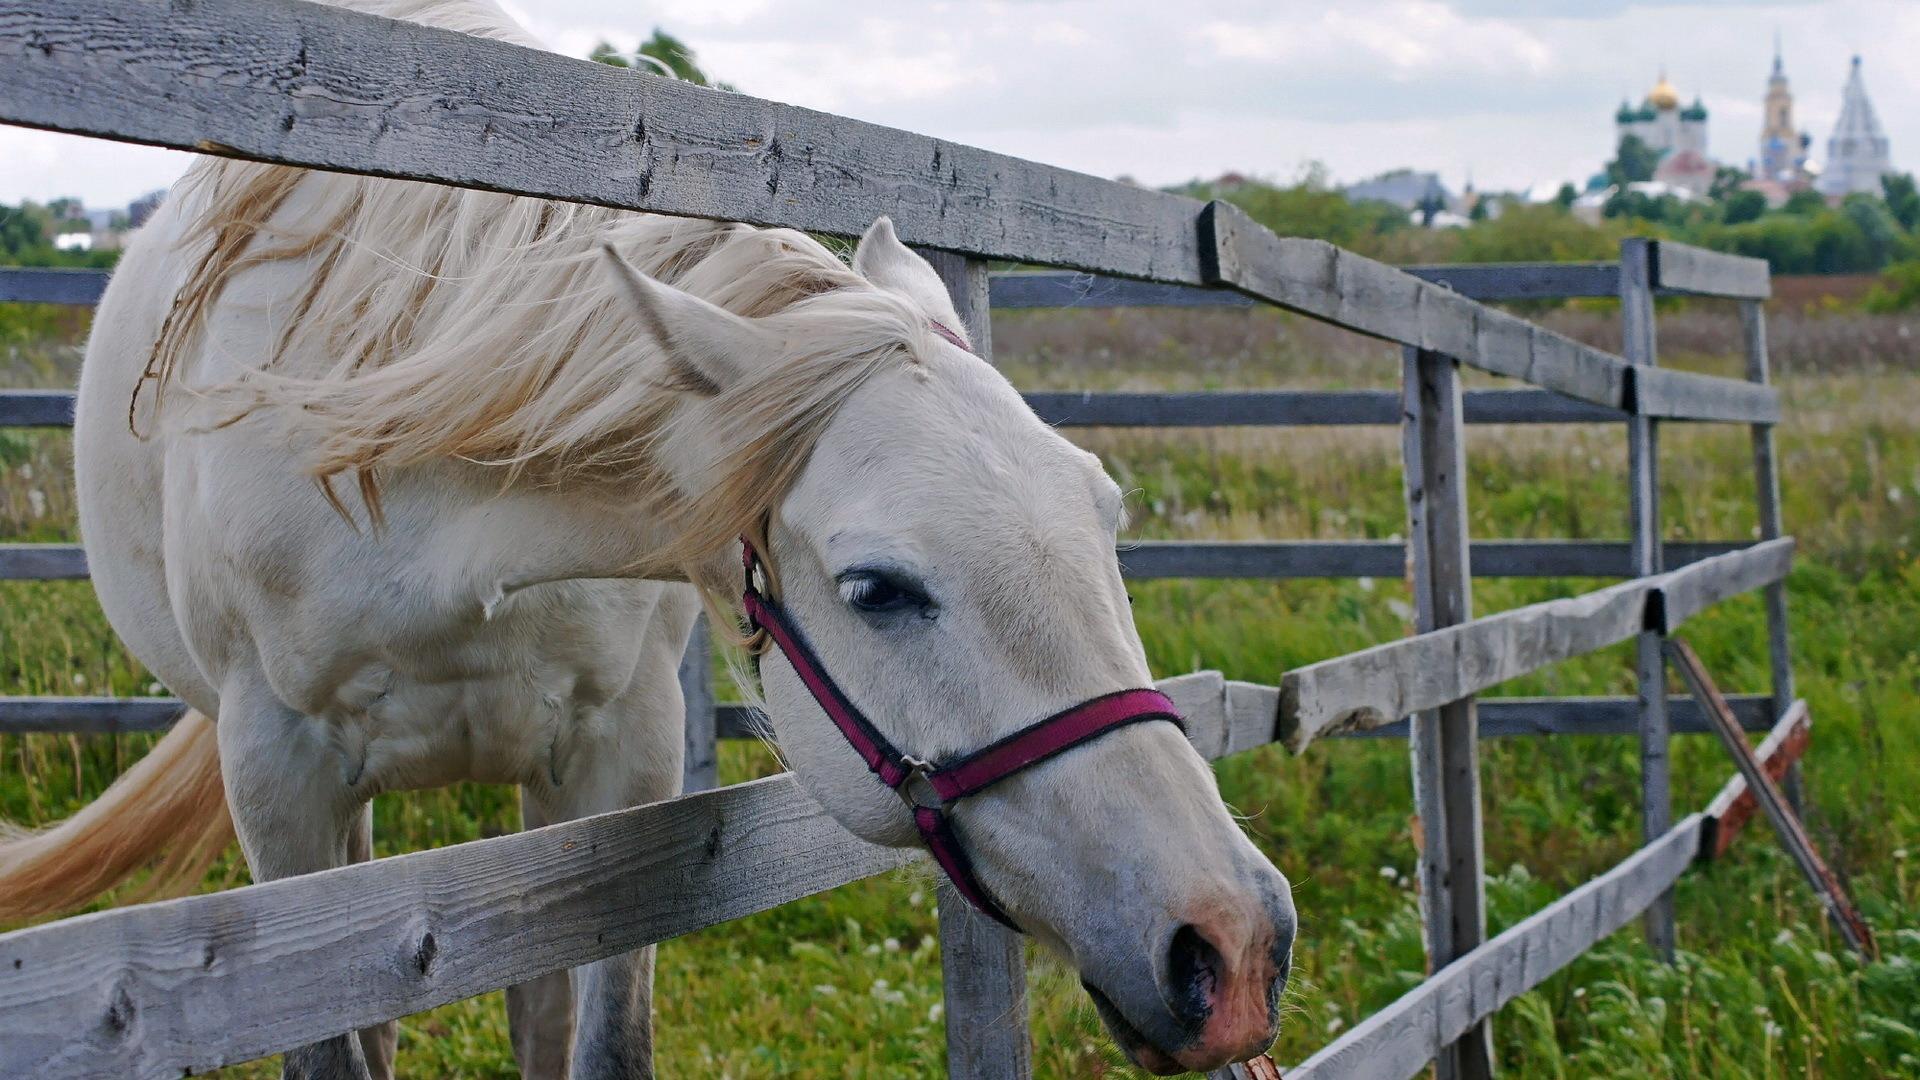 Great Wallpaper Horse High Definition - horse_fence_grass_56568_1920x1080  Gallery_4350.jpg